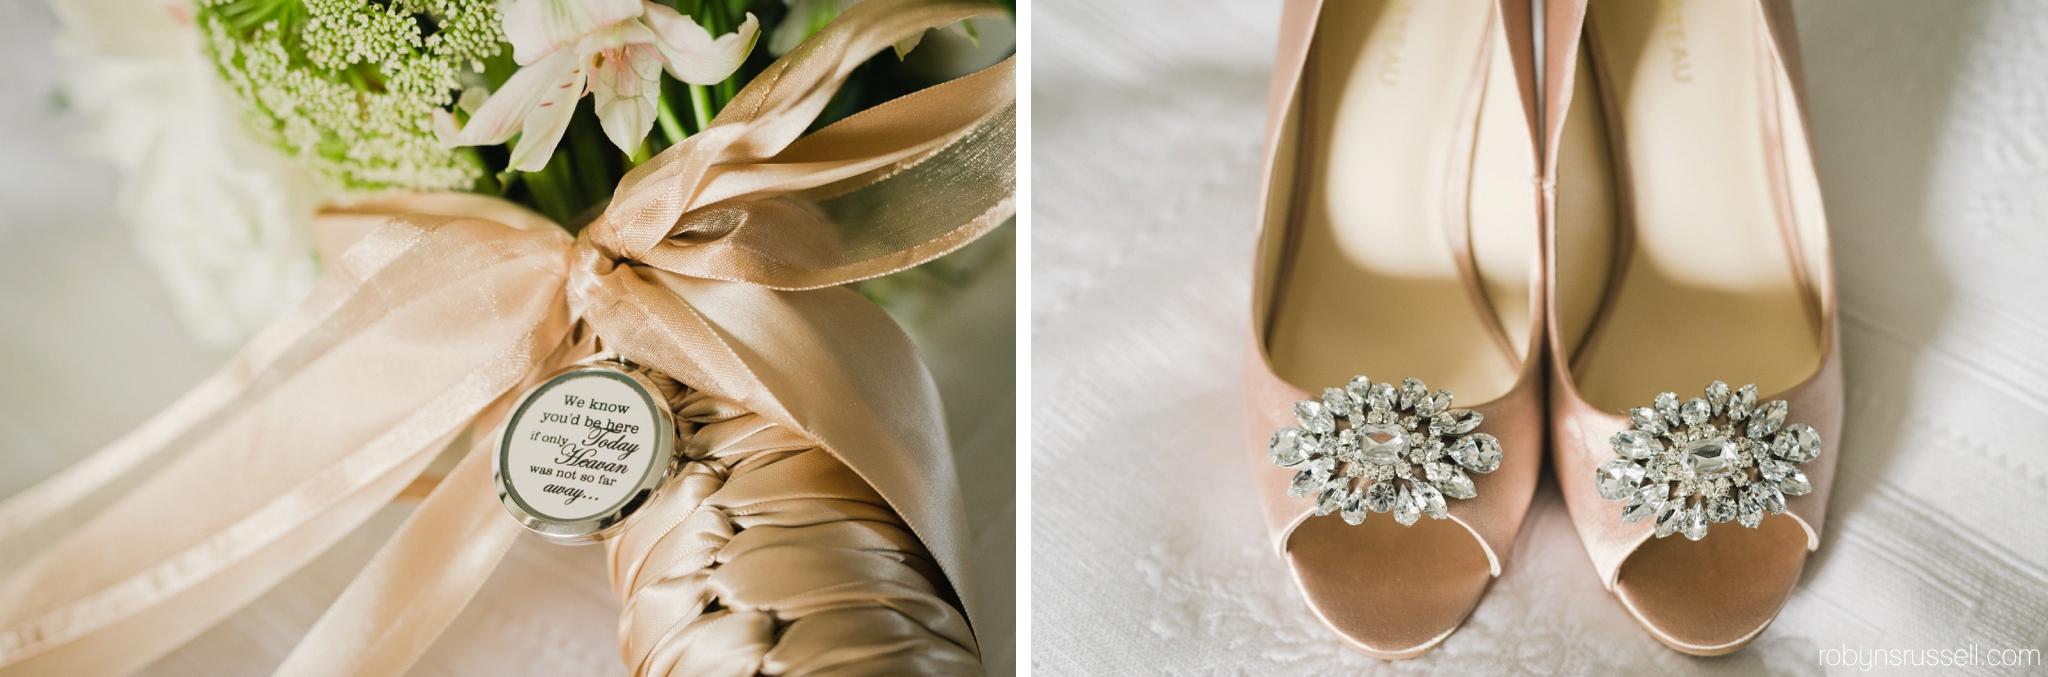 11-bridal-attire-shoes-flowers.jpg